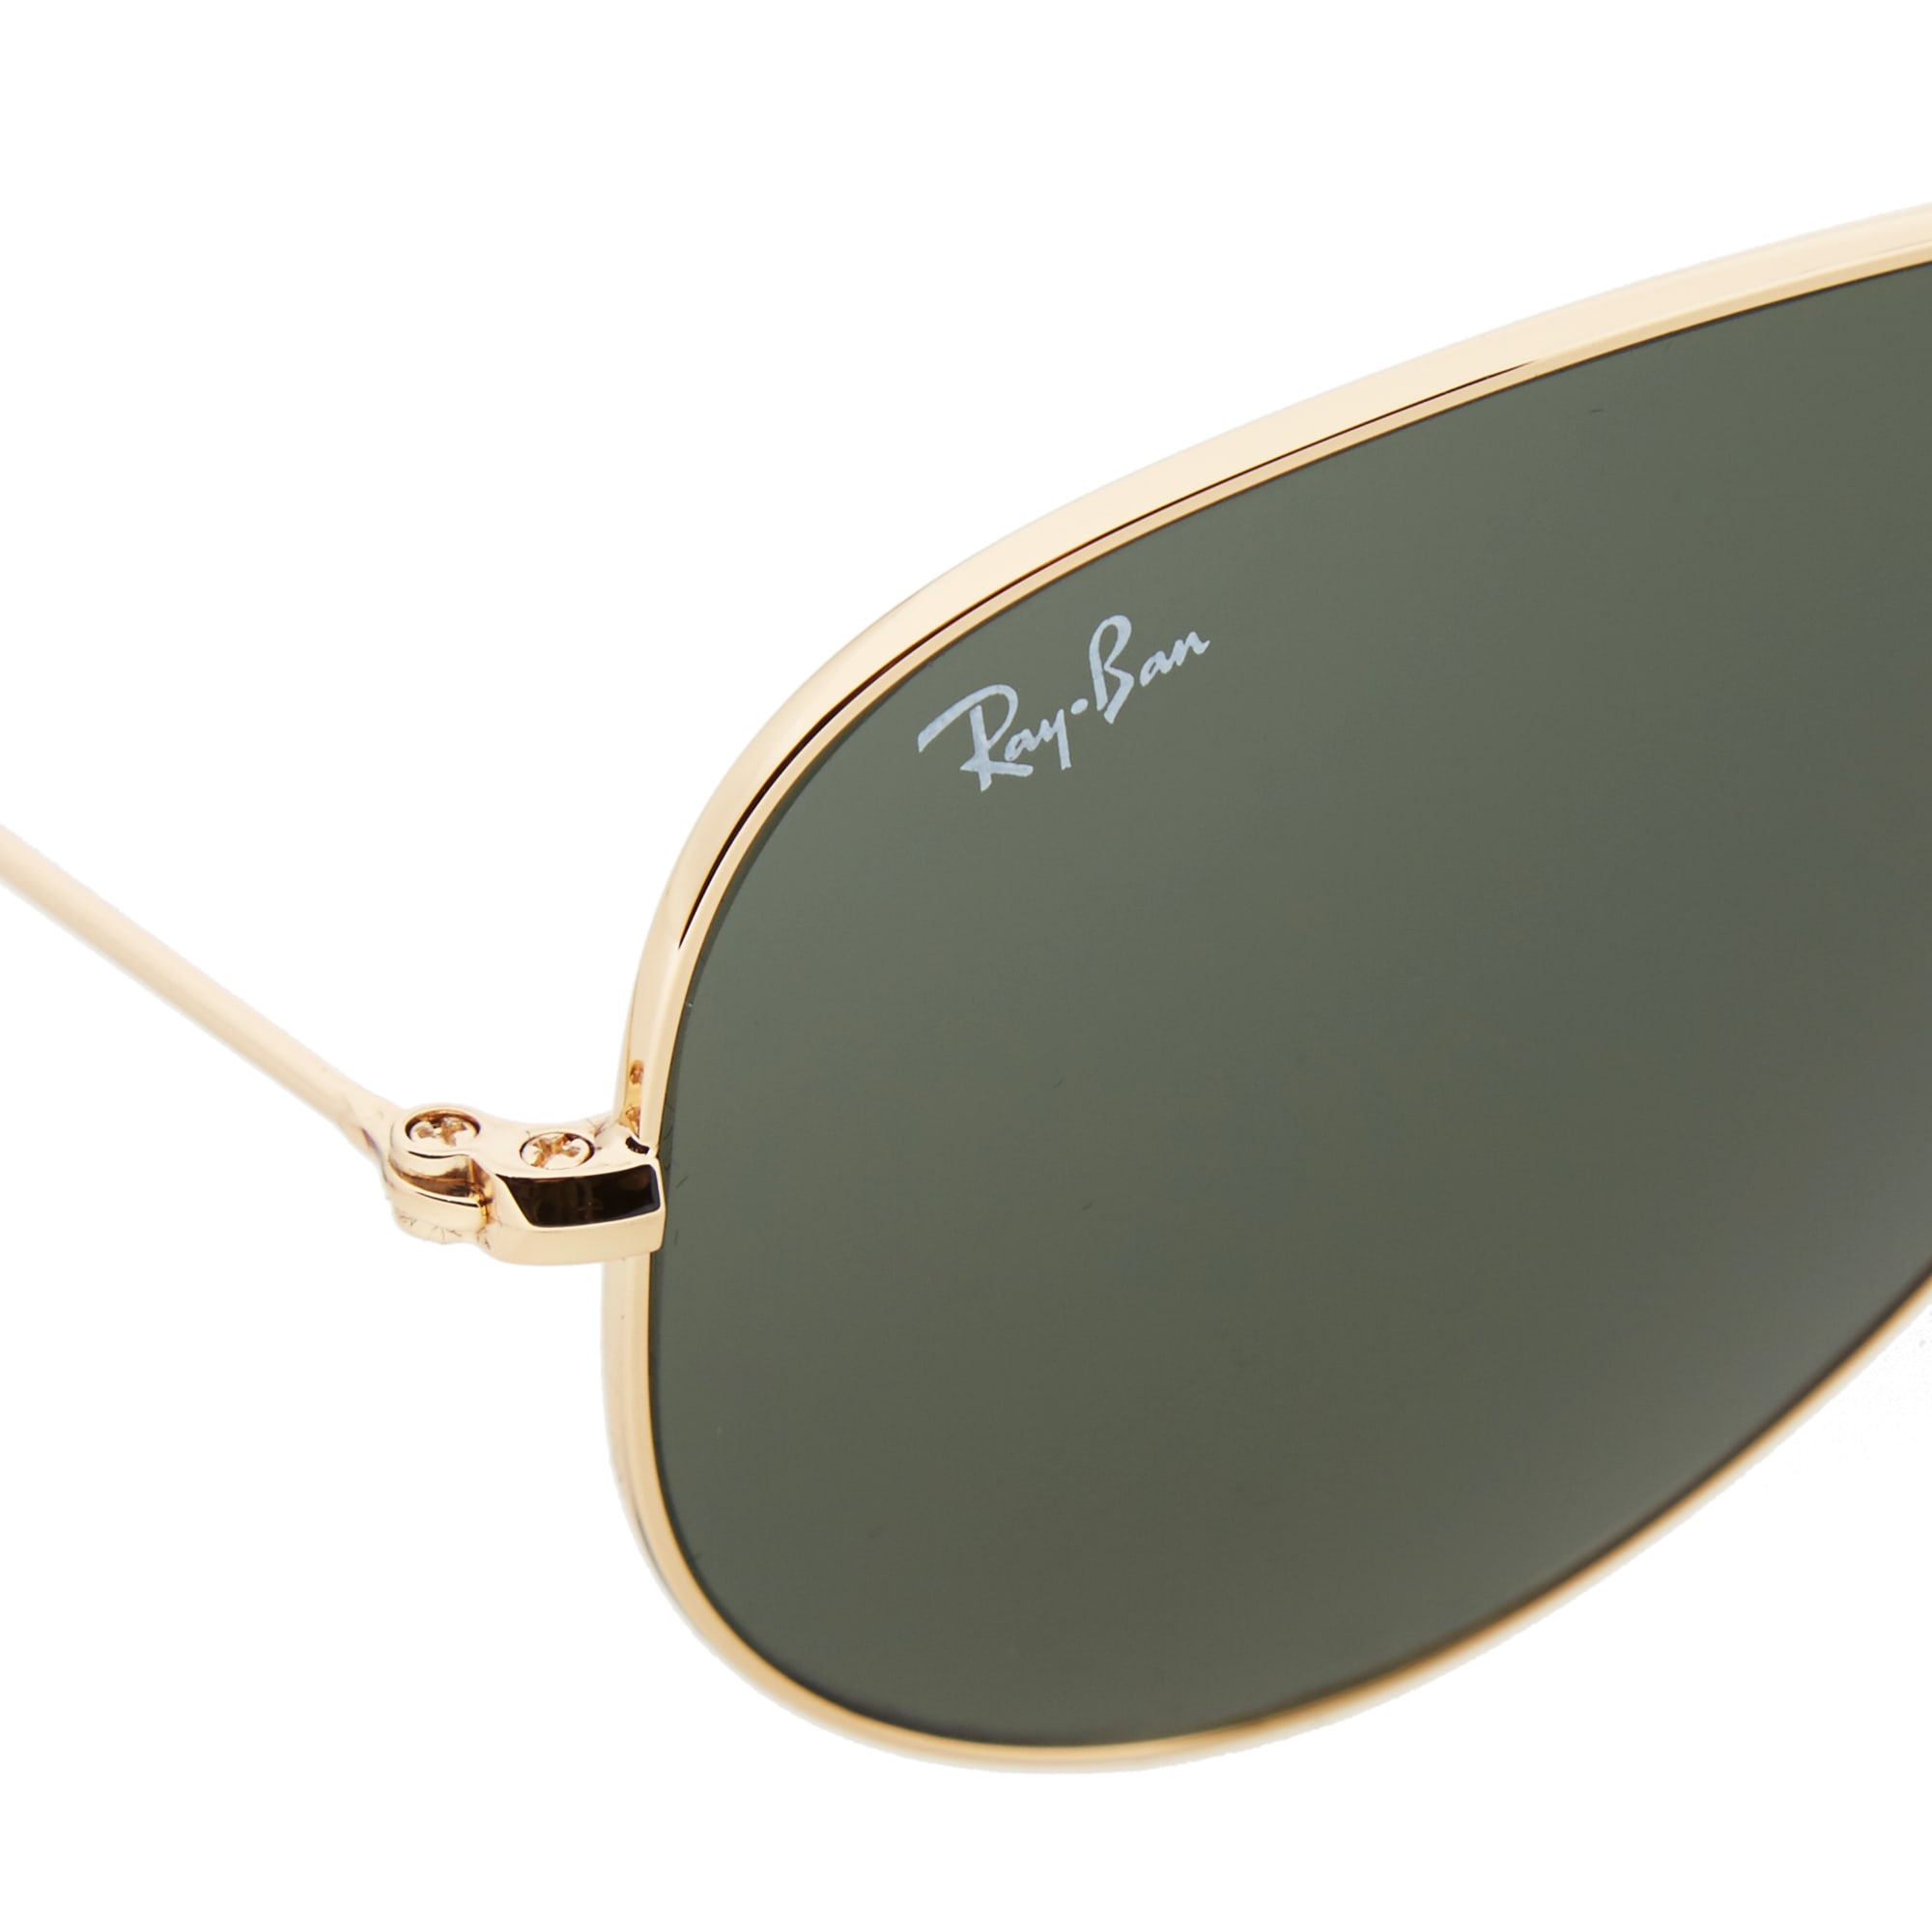 Ray ban sunglasses sale new zealand - Ray Ban Aviators New Zealand